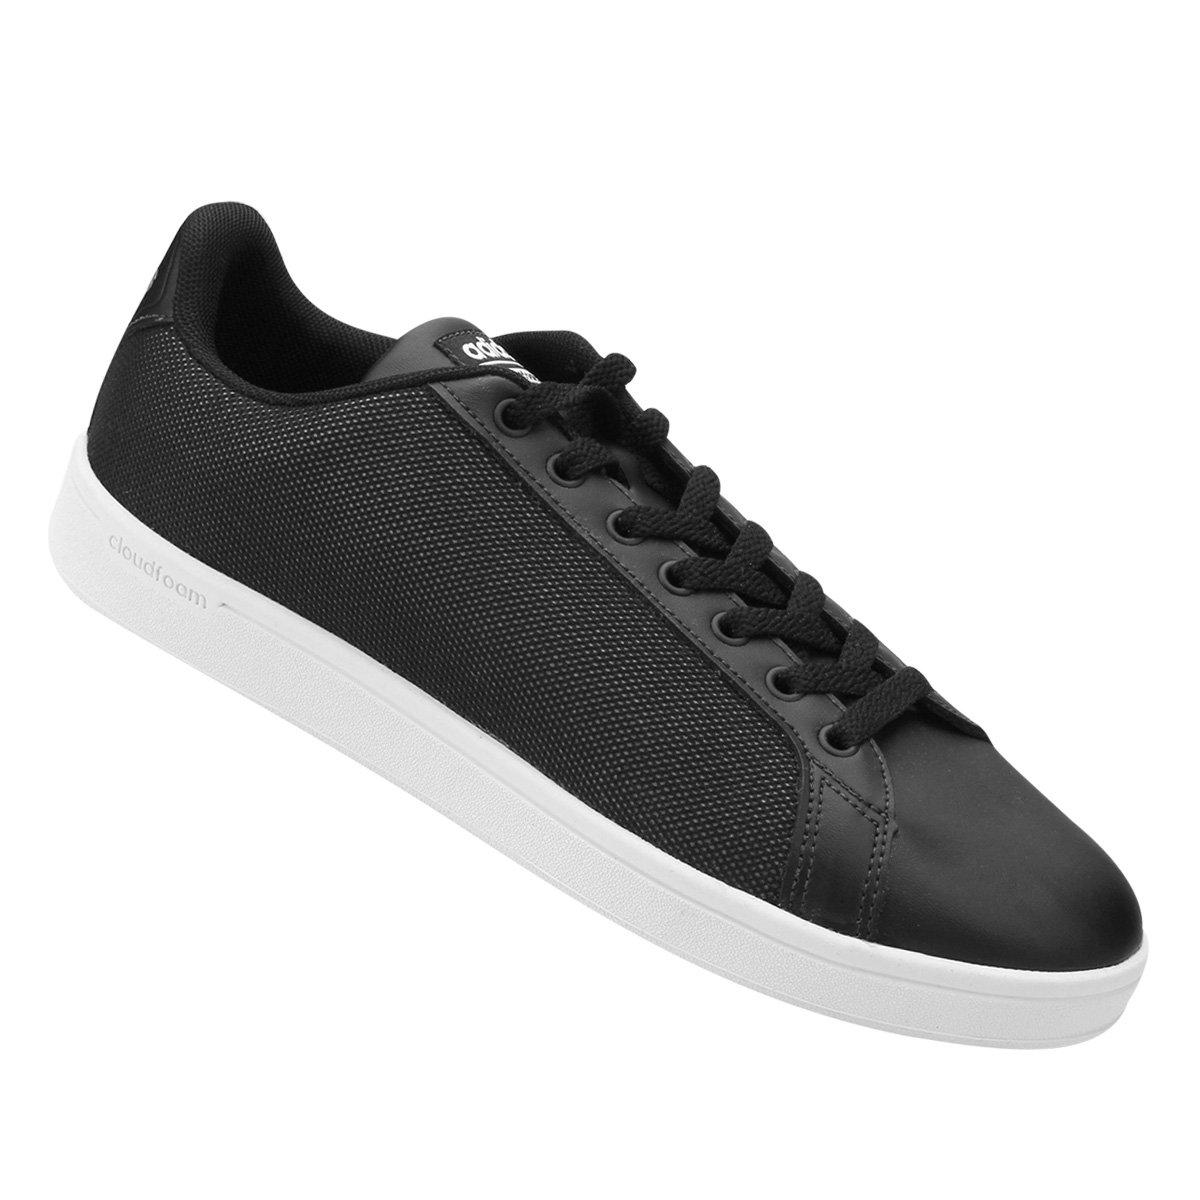 14b64e43e9 Tênis Adidas CF Advantage Clean Masculino - Compre Agora